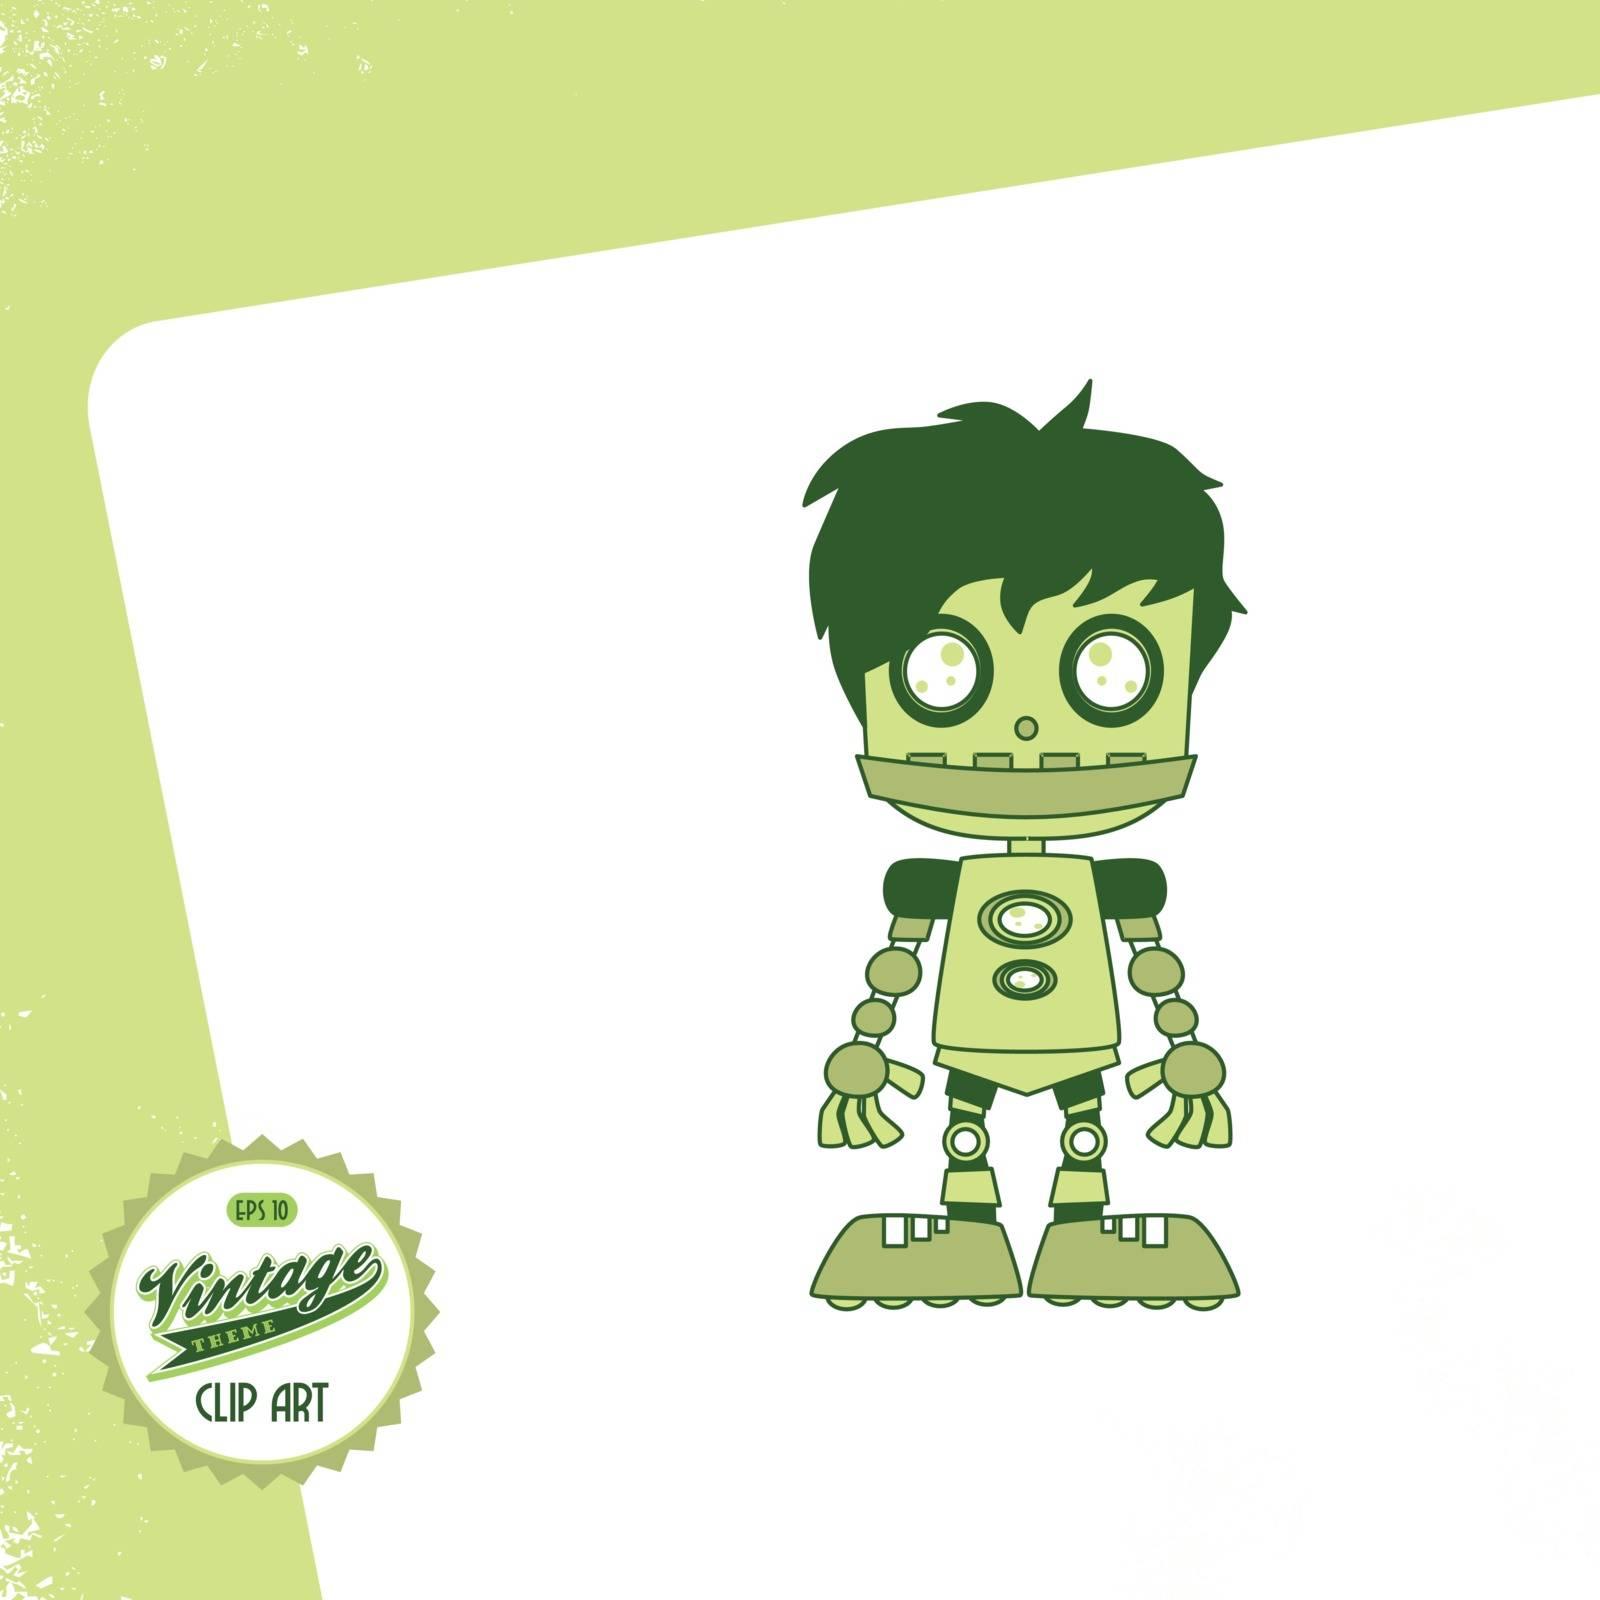 editable cartoon character vector graphic art design illustration